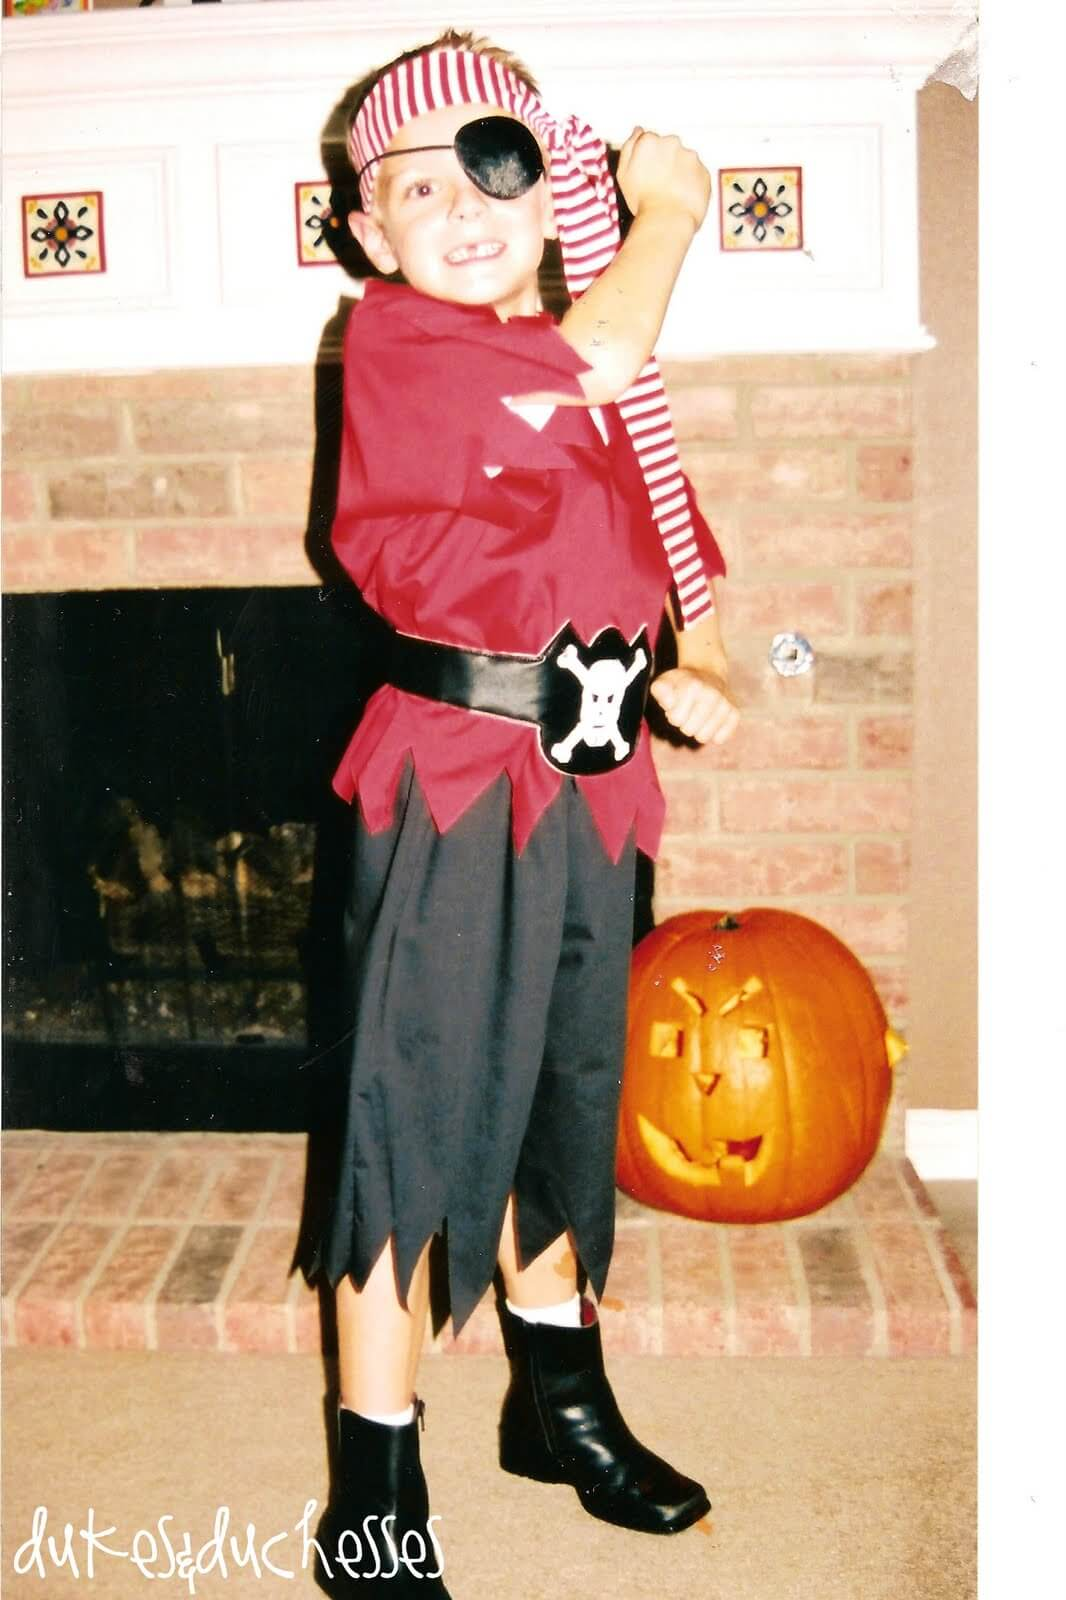 Homemade Halloween Costumes - Dukes and Duchesses